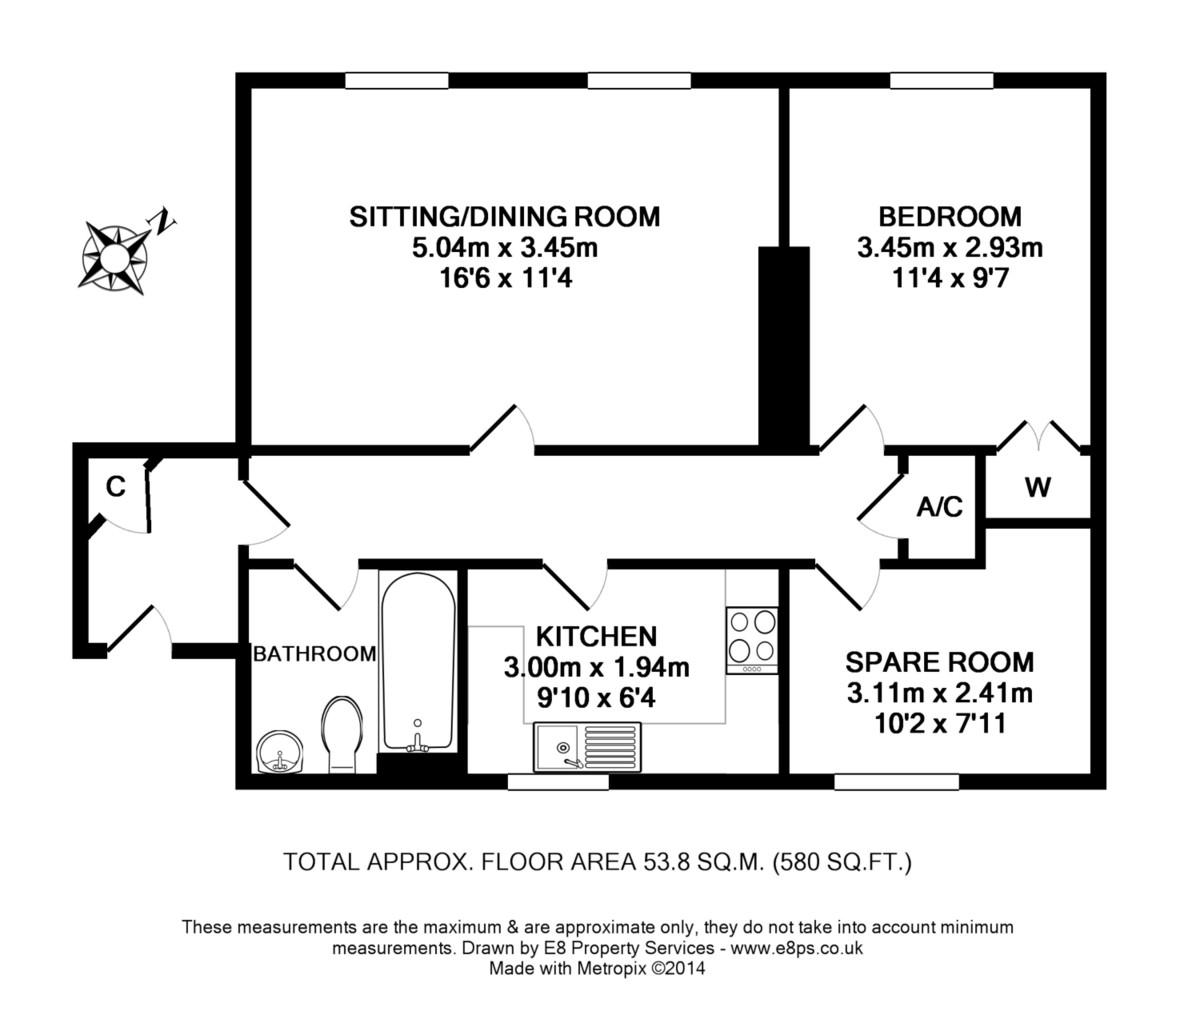 Mandelbrote Drive, Littlemore, Oxford OX4, 2 bedroom flat